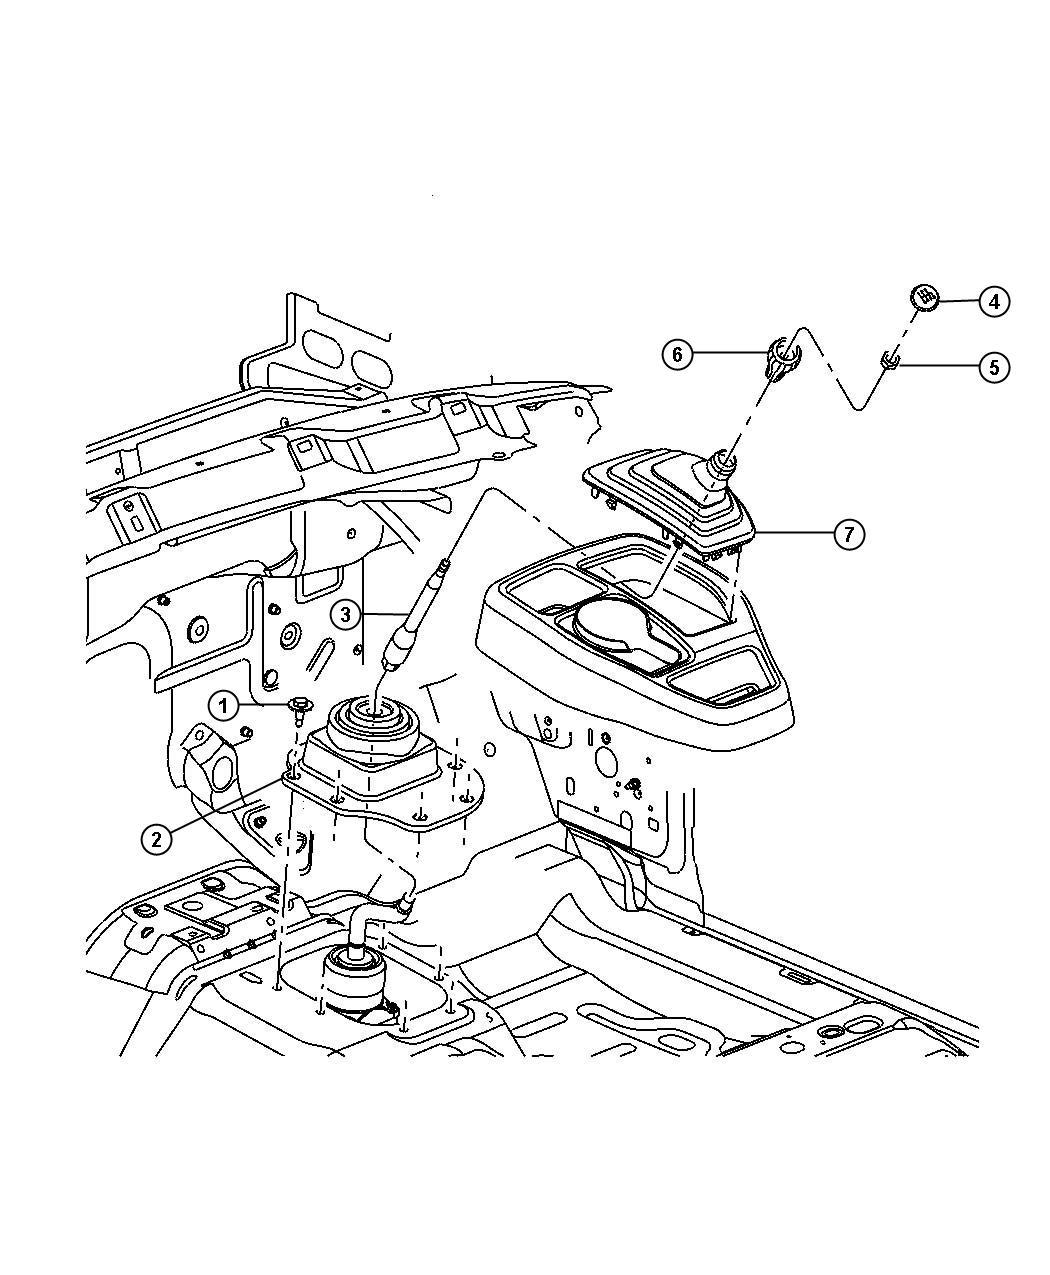 Dodge Dakota Insert. Transmission shift knob. Gearshift